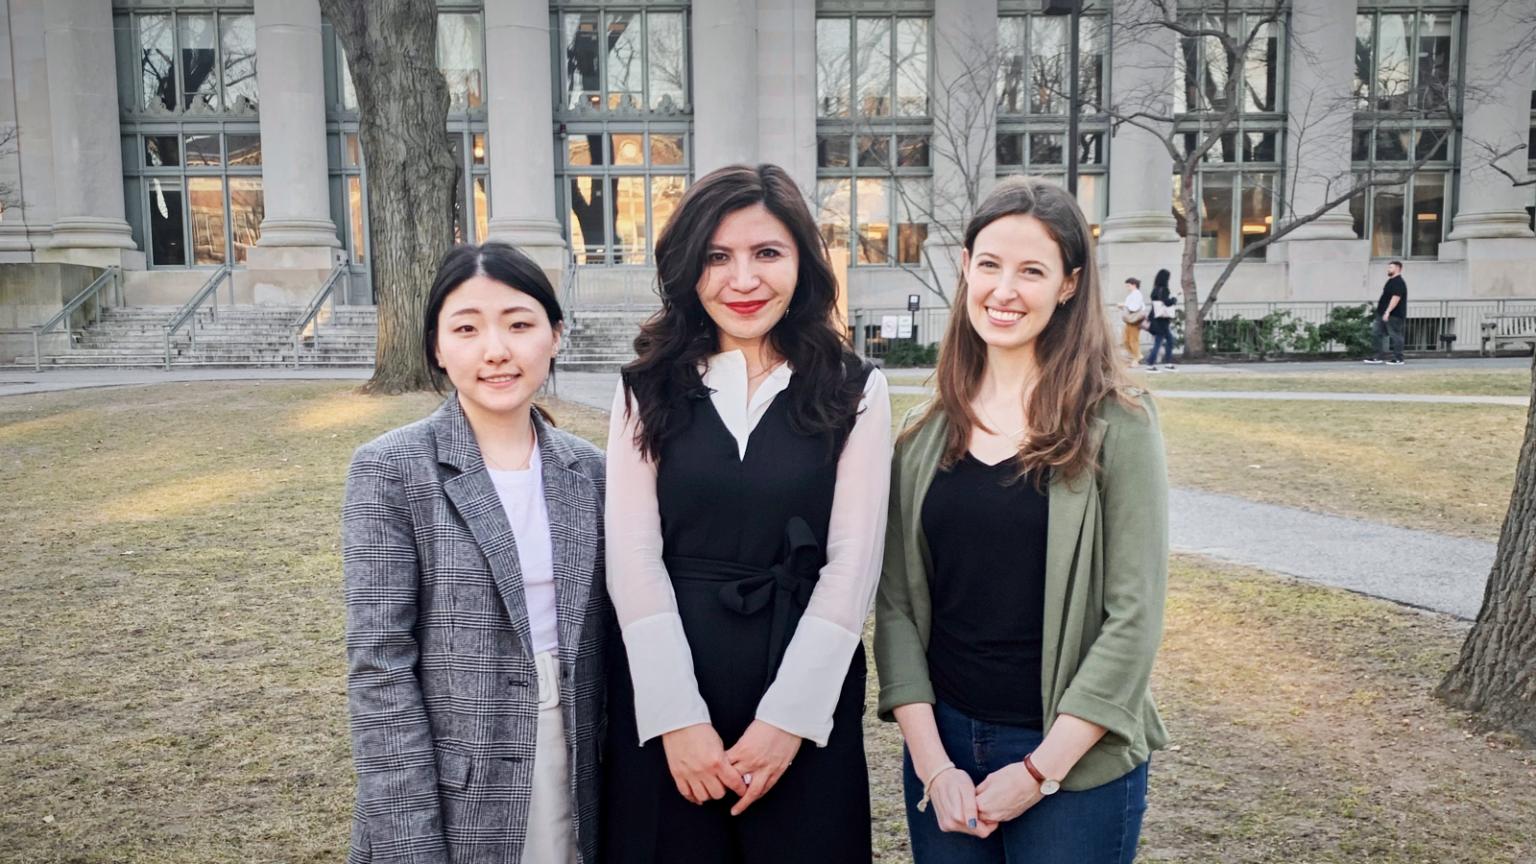 Rayhan smiles with Jasmine Shin (left) and Samantha Lint (right) in Harvard Yard.